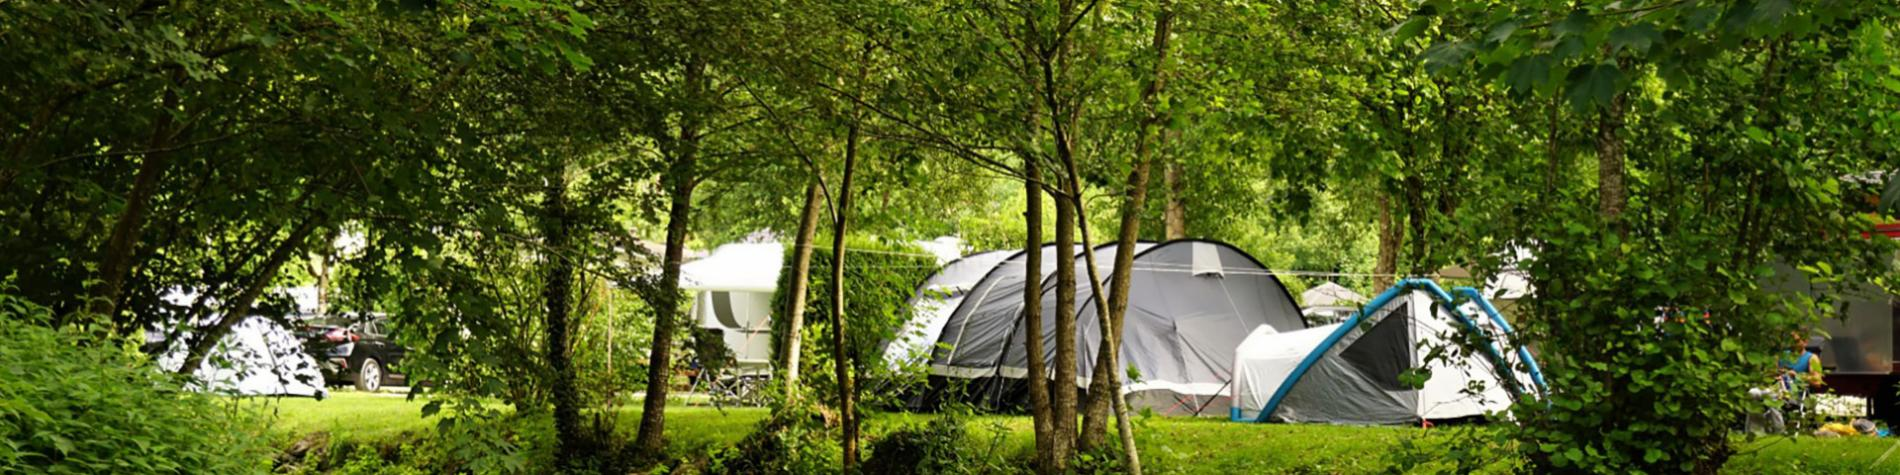 Camping - Domaine du Bocq - Purnode